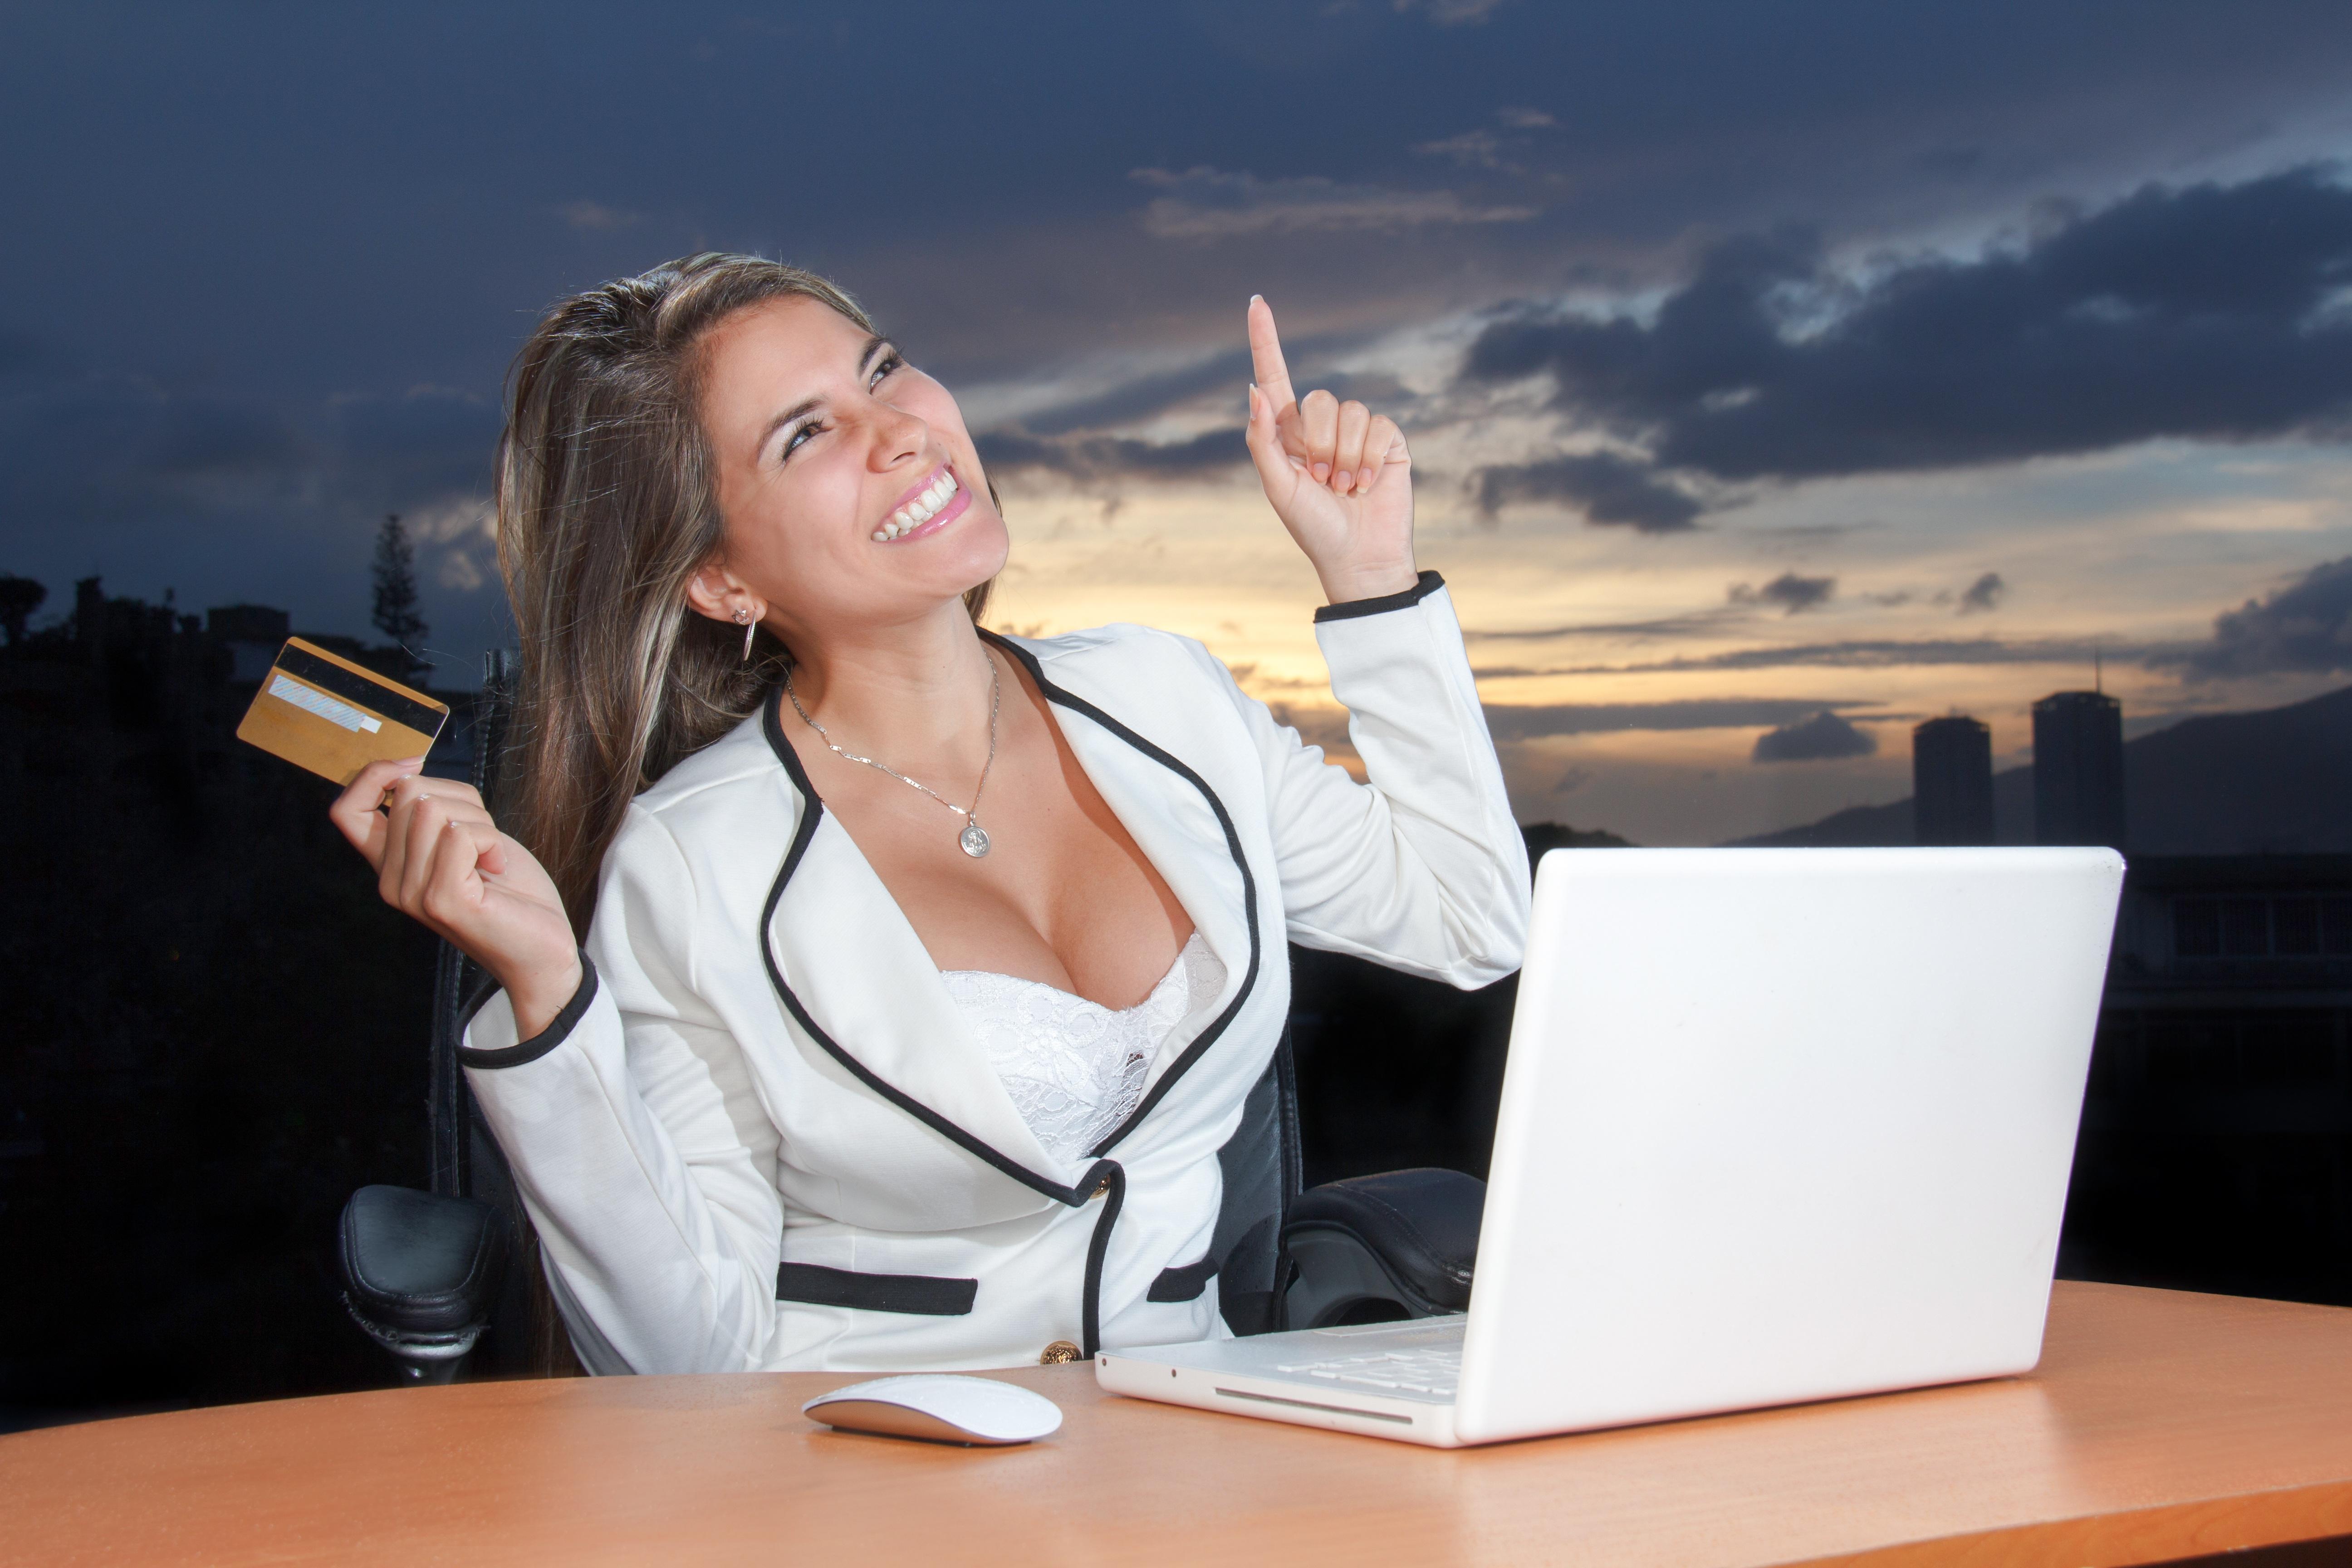 девушке за работой онлайн